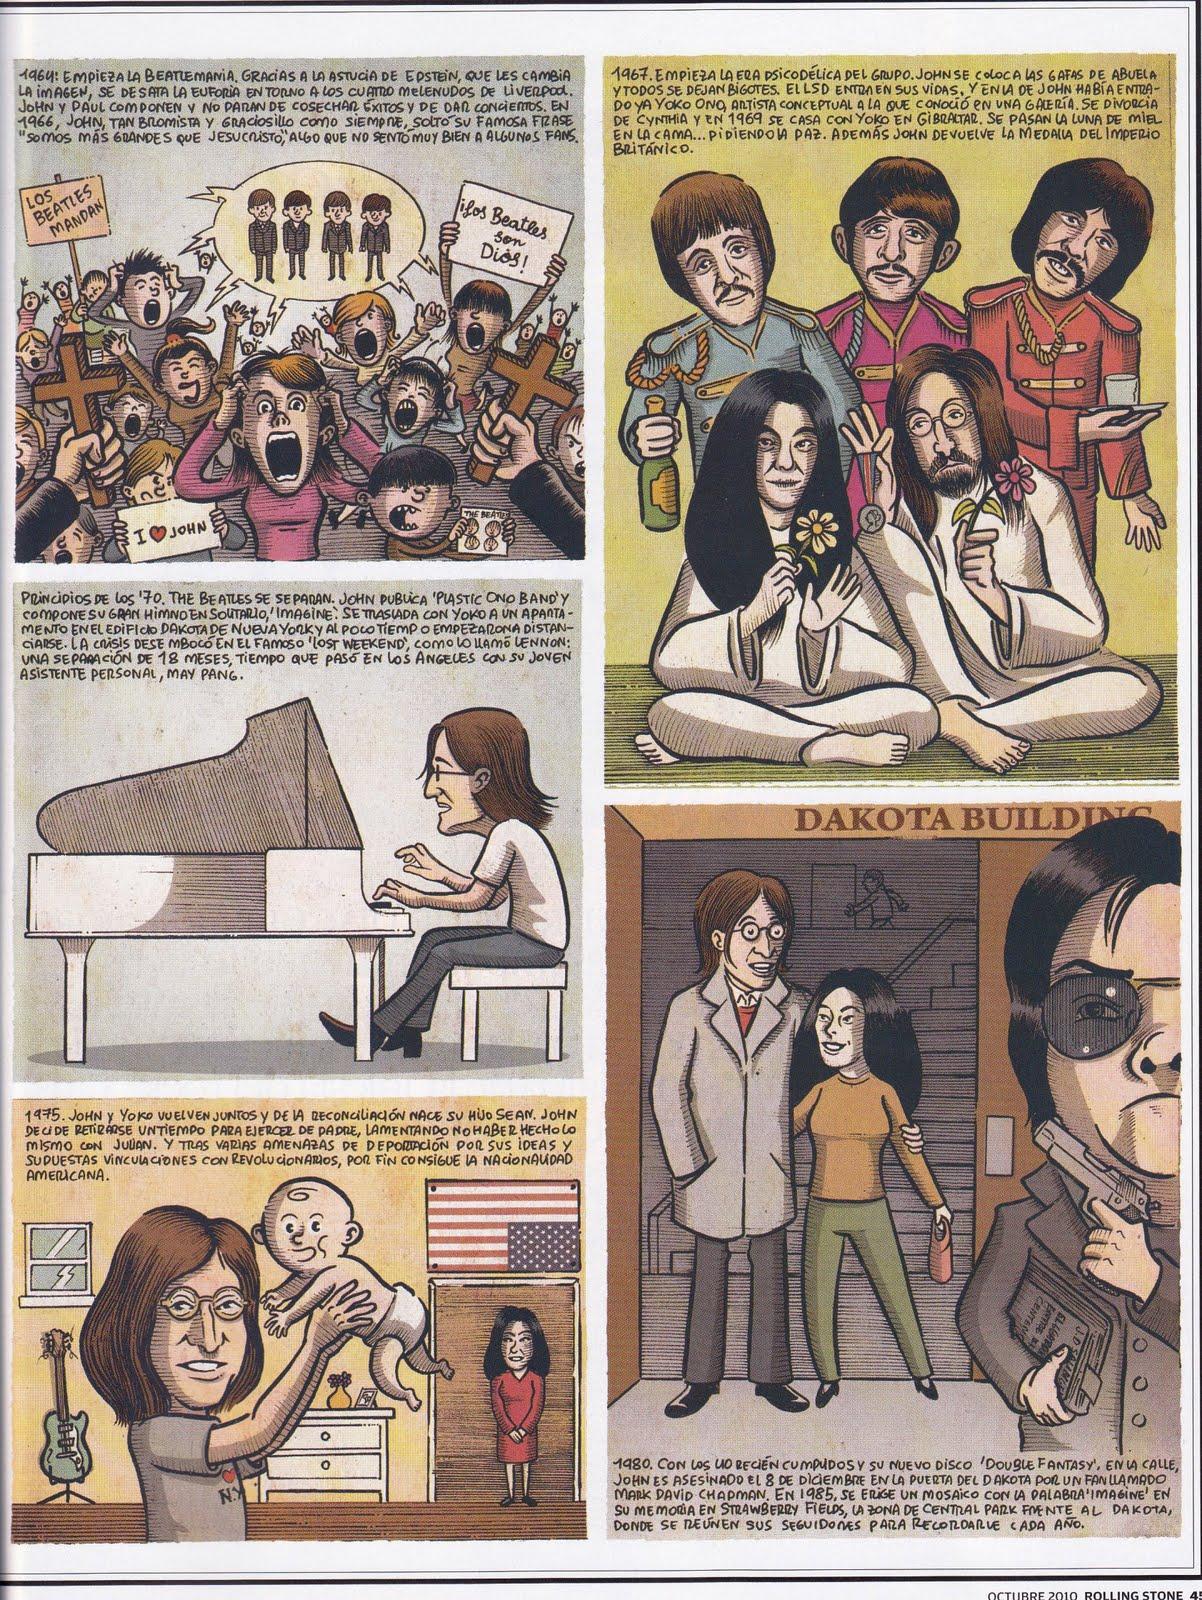 John Lennon Rolling Stone Interview John Lennon Rolling Stone